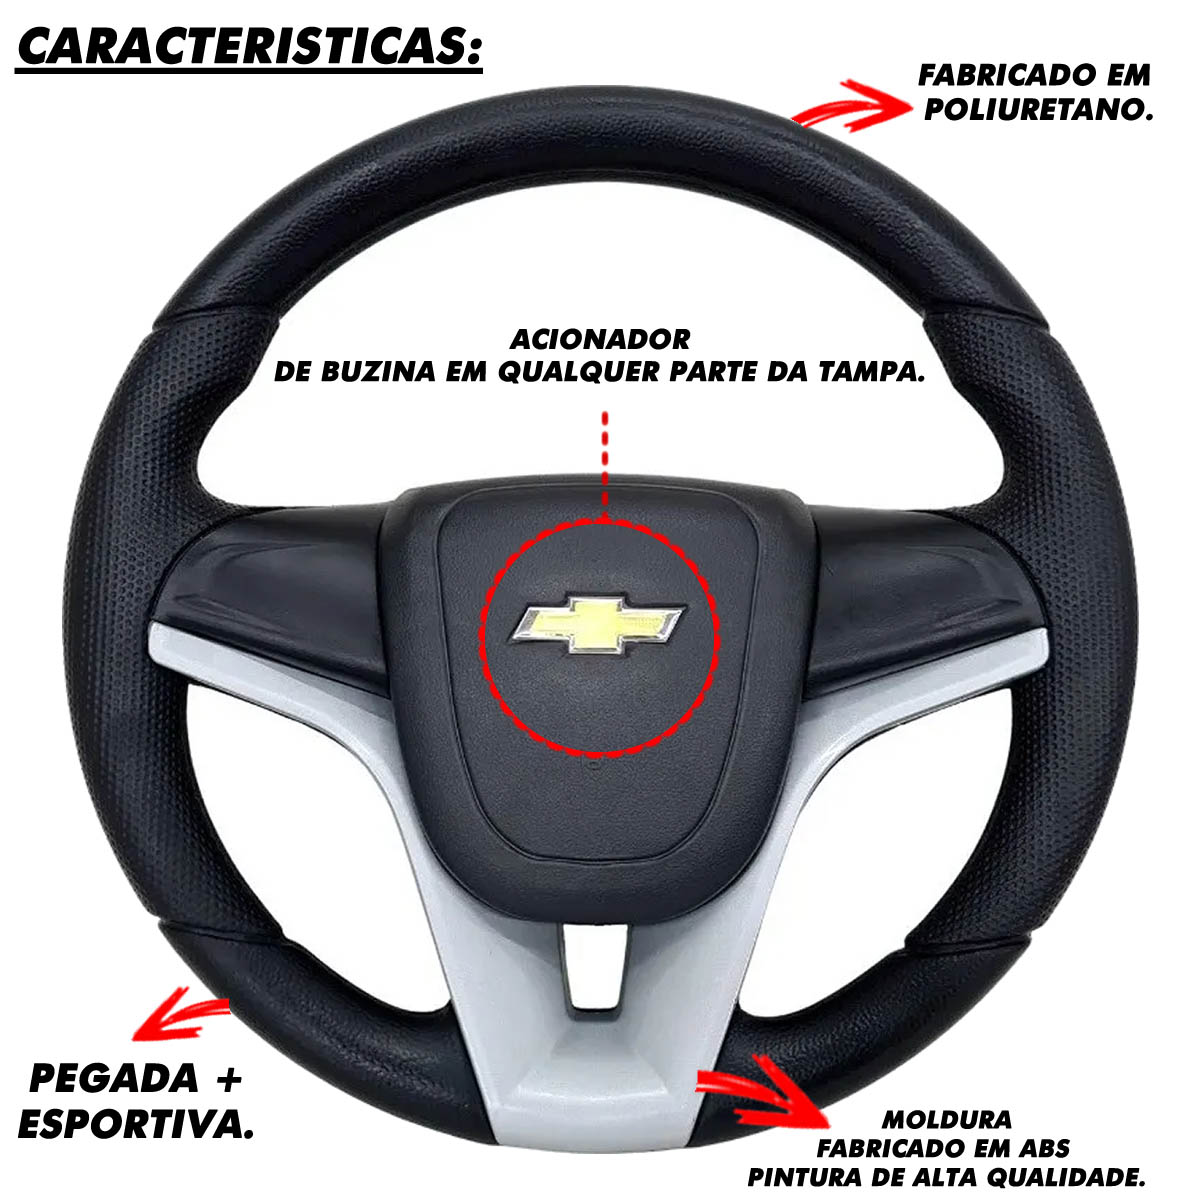 Volante Chevrolet de Camaro Esportivo Cubo S10 Blazer Silverado 1995 a 2013 Opala Chevette 1968 a 1998 Poliparts